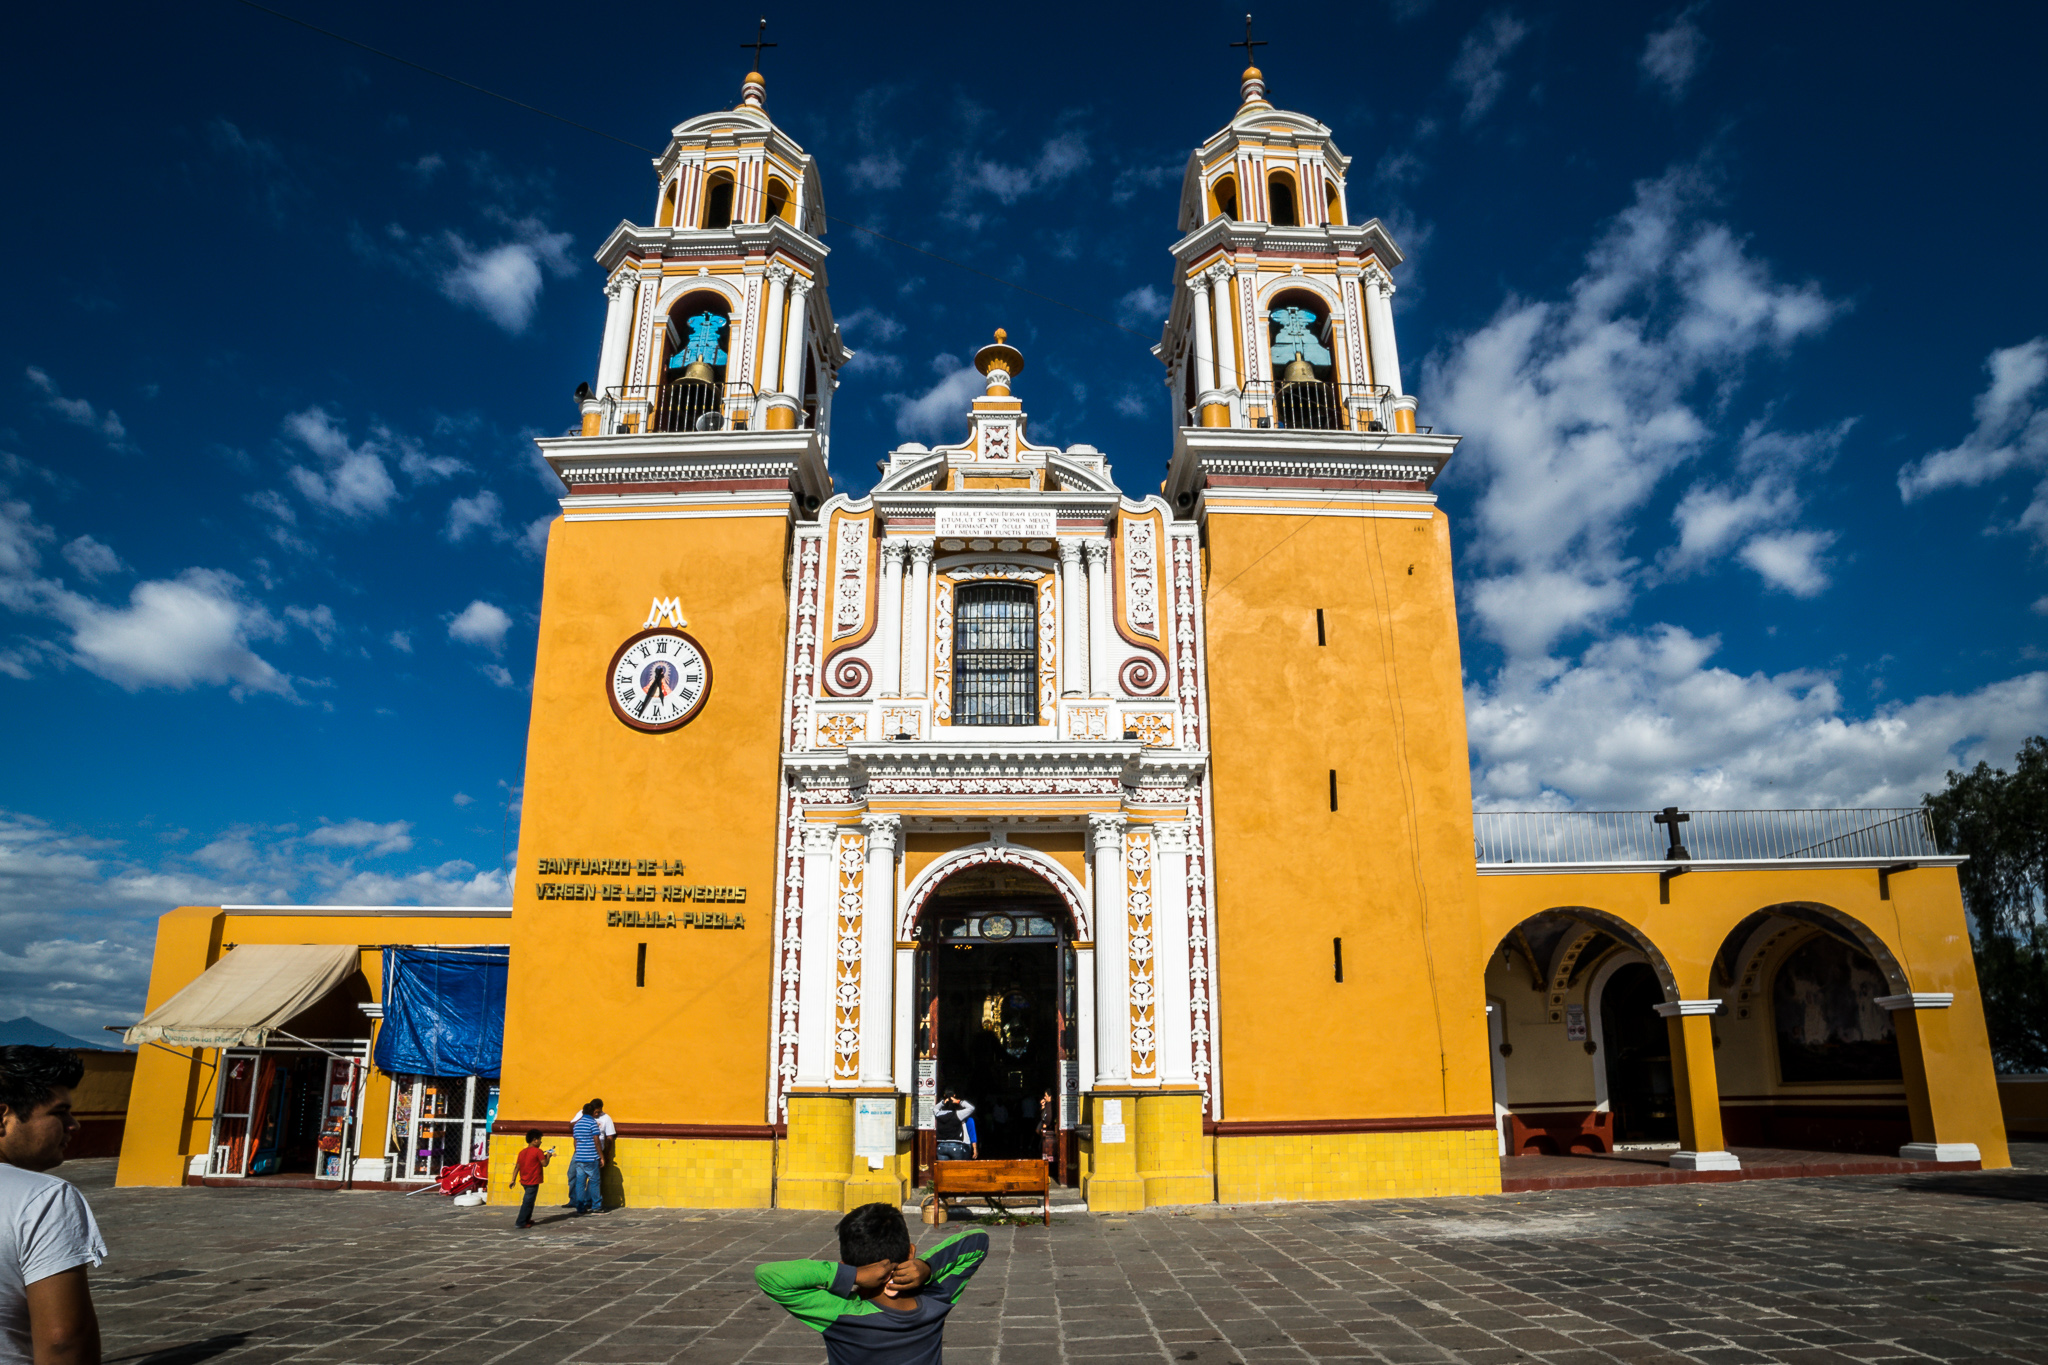 Mexique Juin 2014_002.jpg